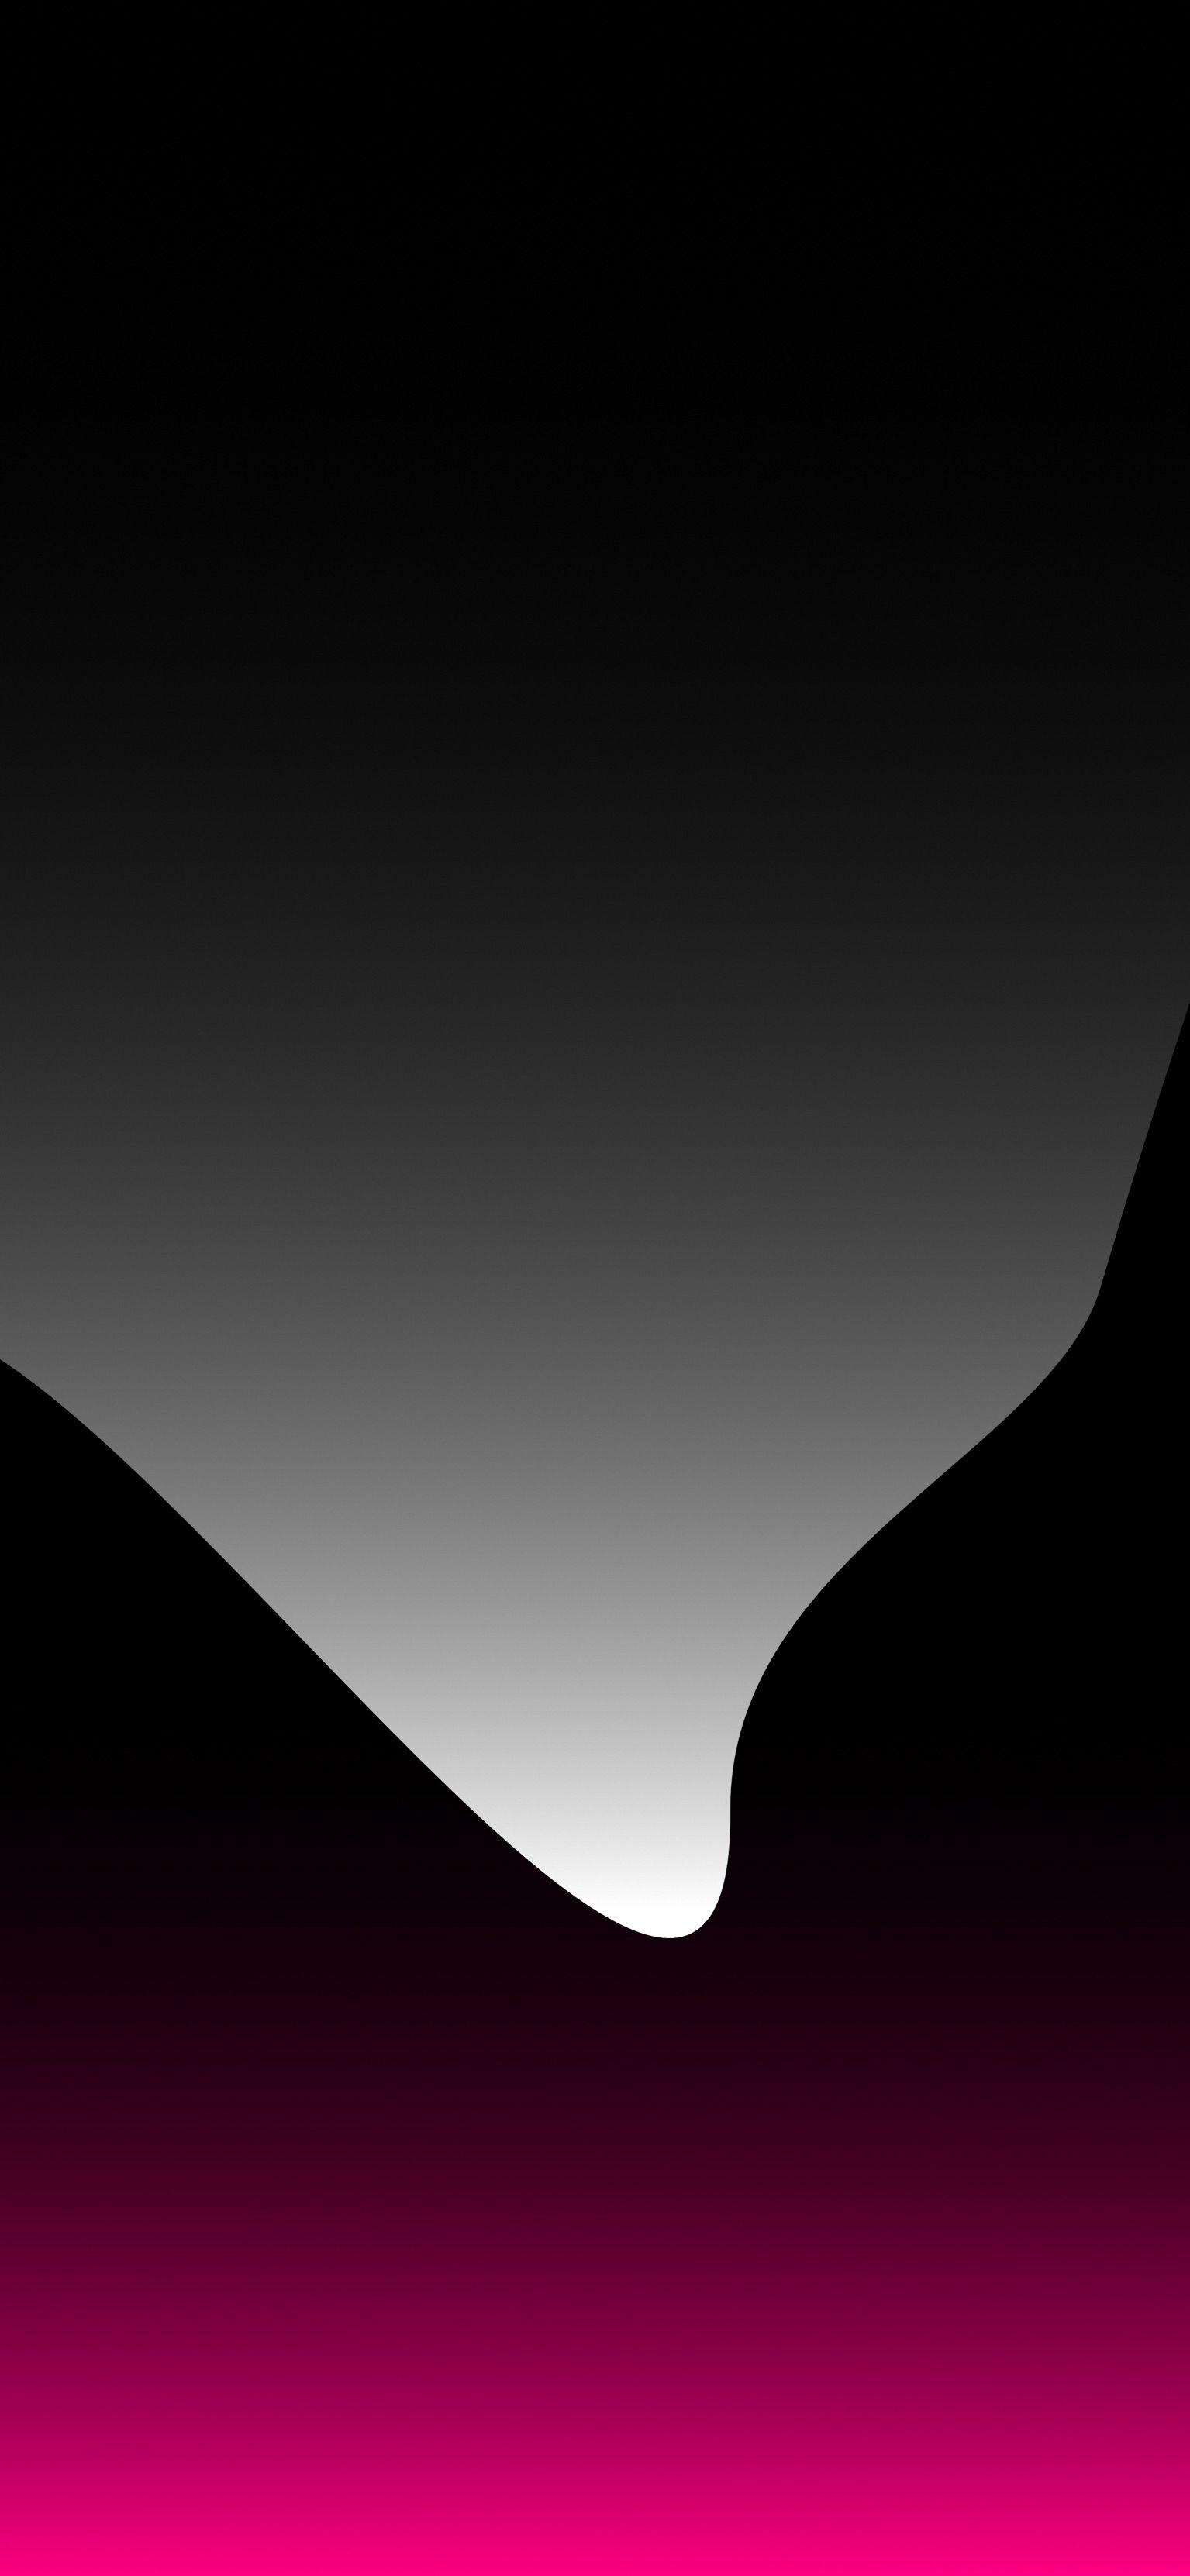 Phone Wallpaper Designed By C Hotspot4u Iphone Iphonewallpaper